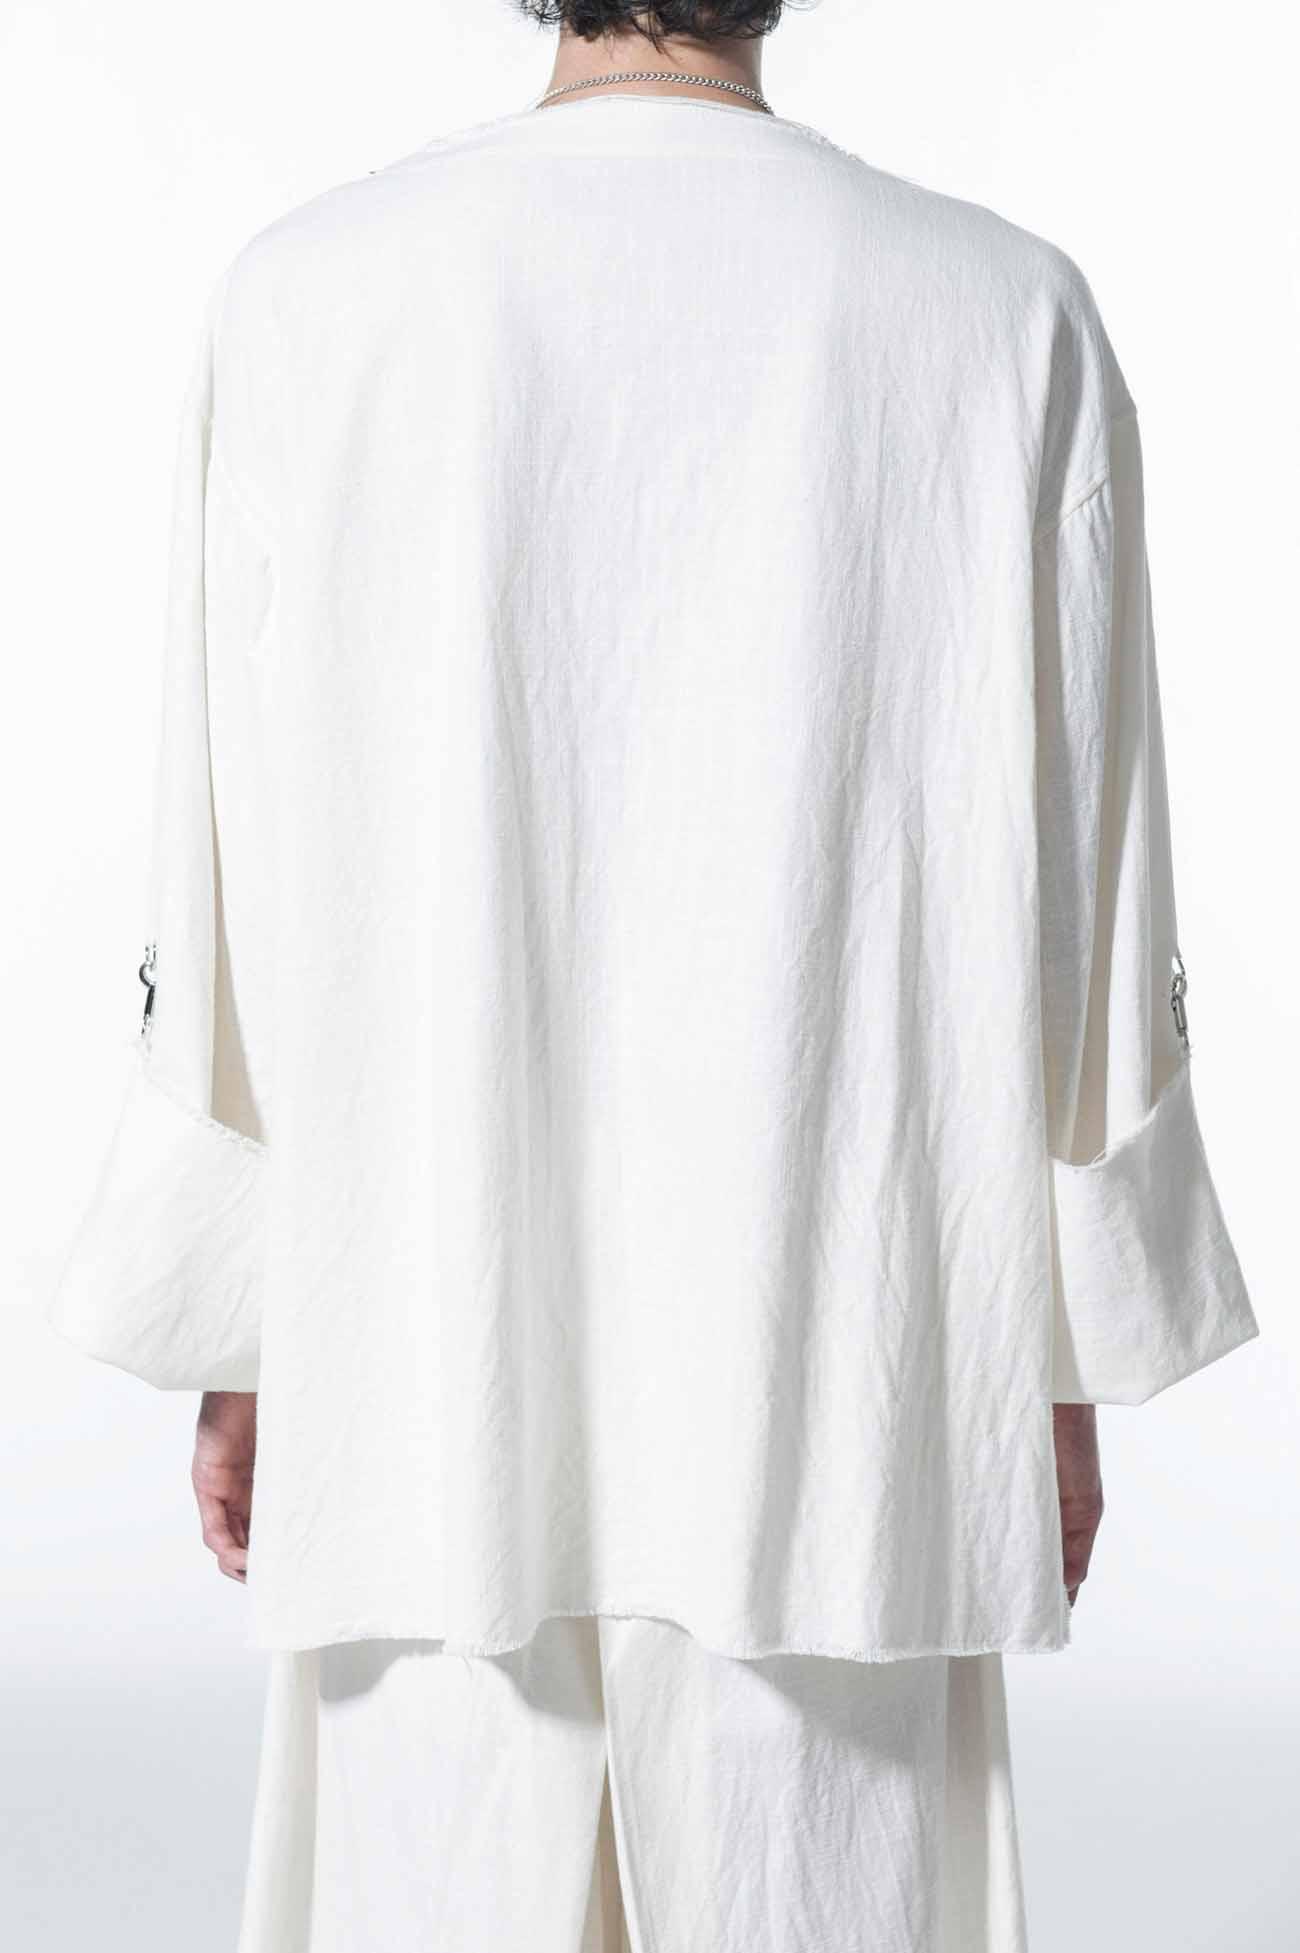 Indian Kadi Sheeting Bondage Muslin Shirt